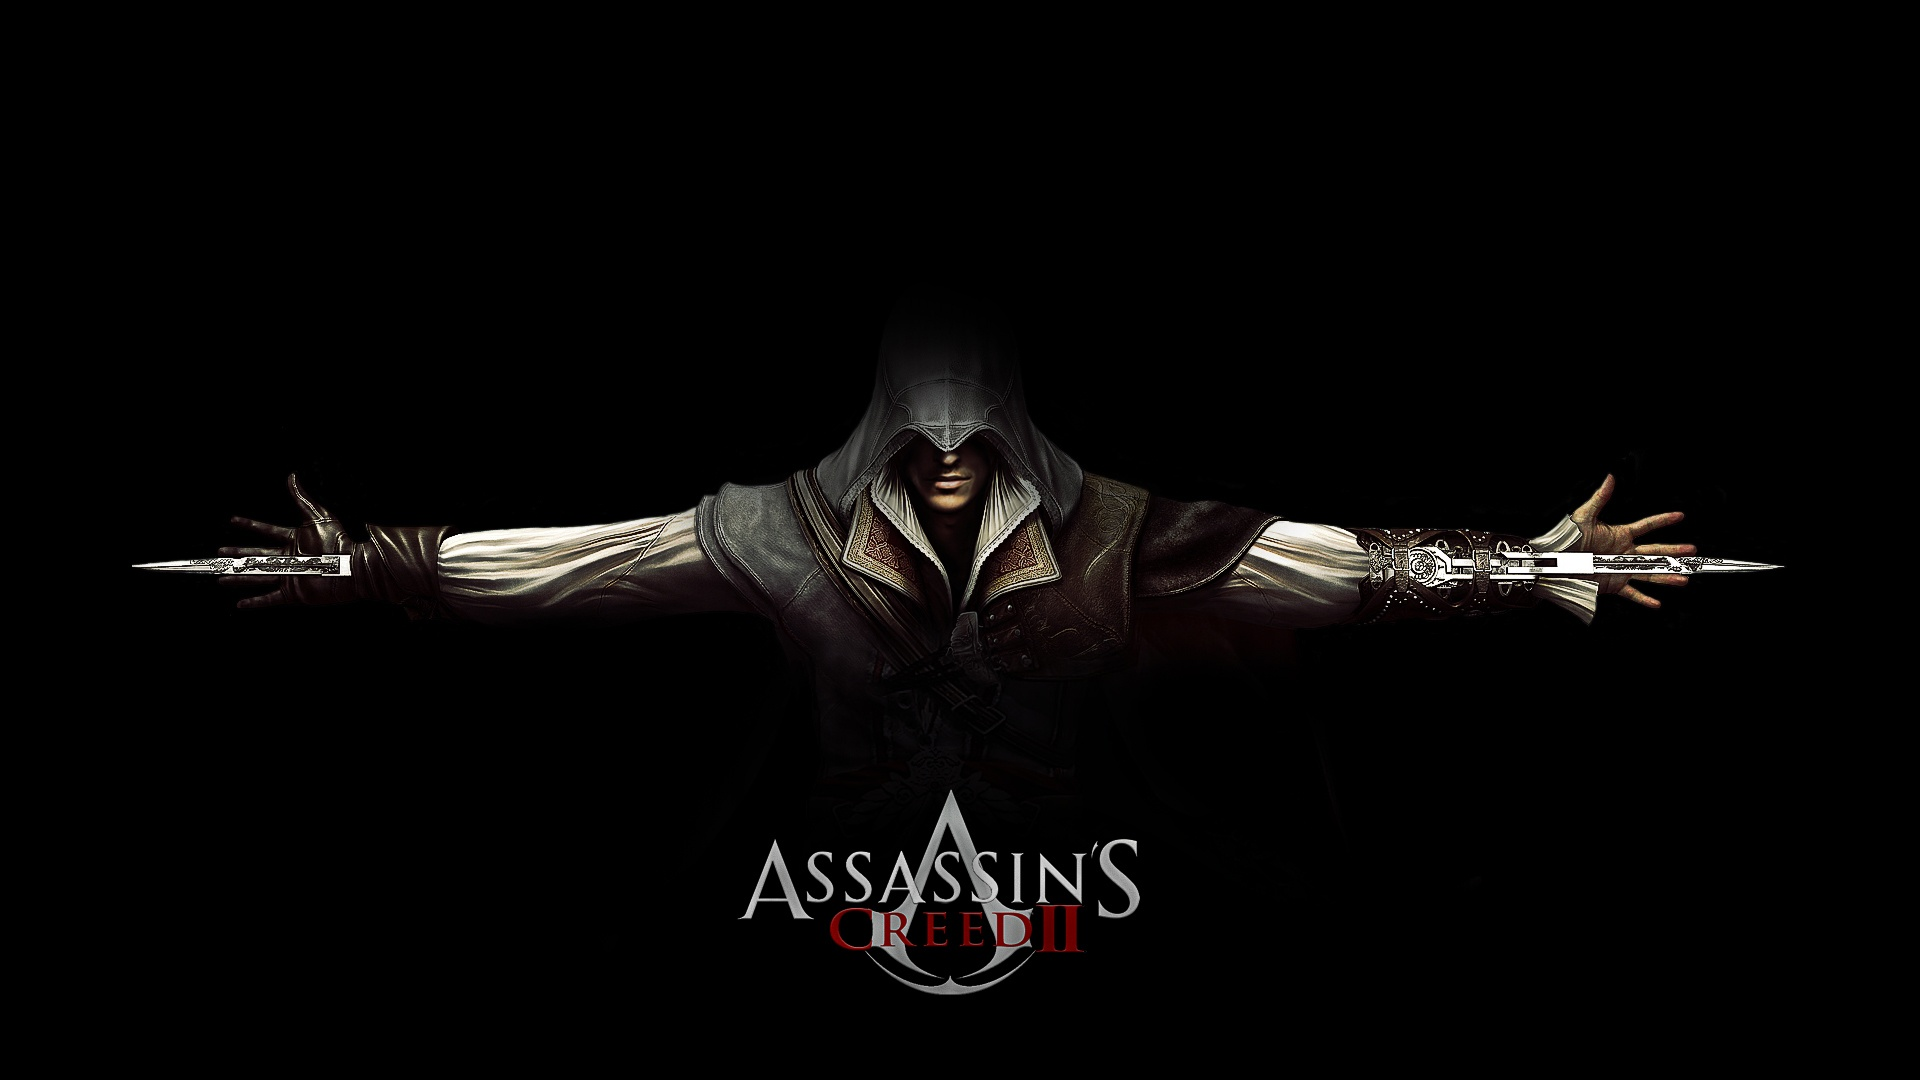 assassin cree II black wallpaper